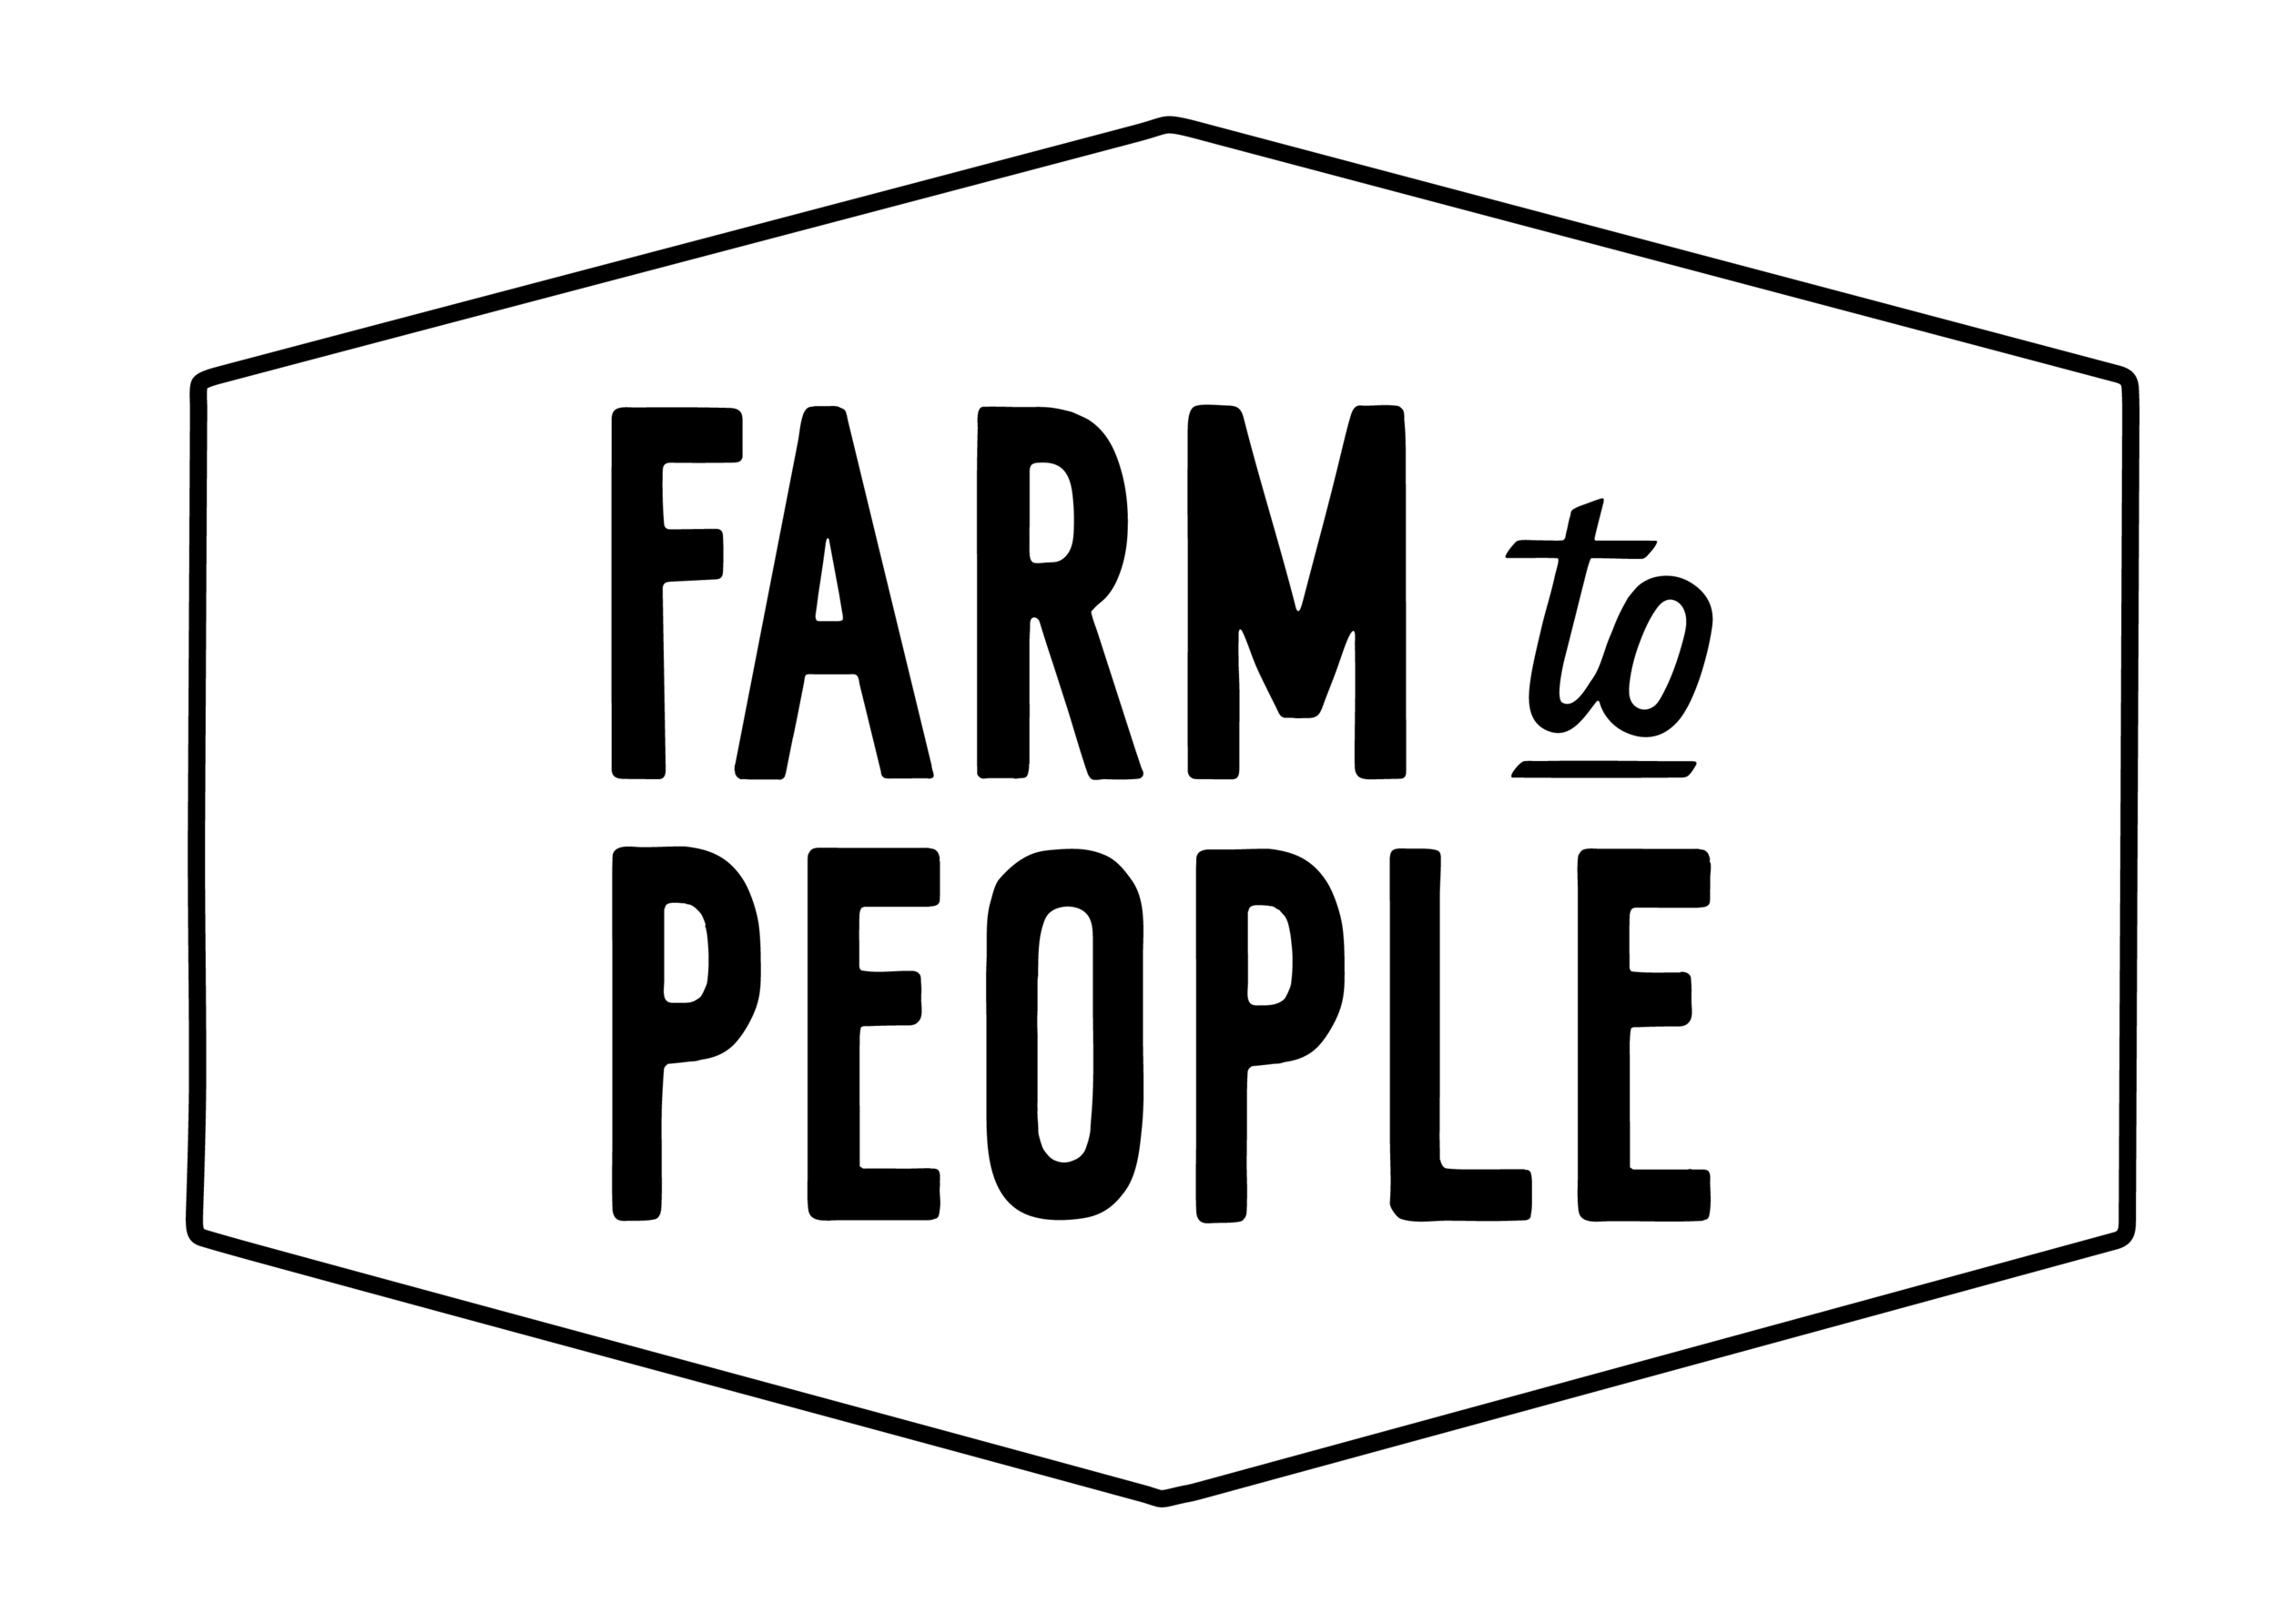 Logos final (RGB for web)-04.png